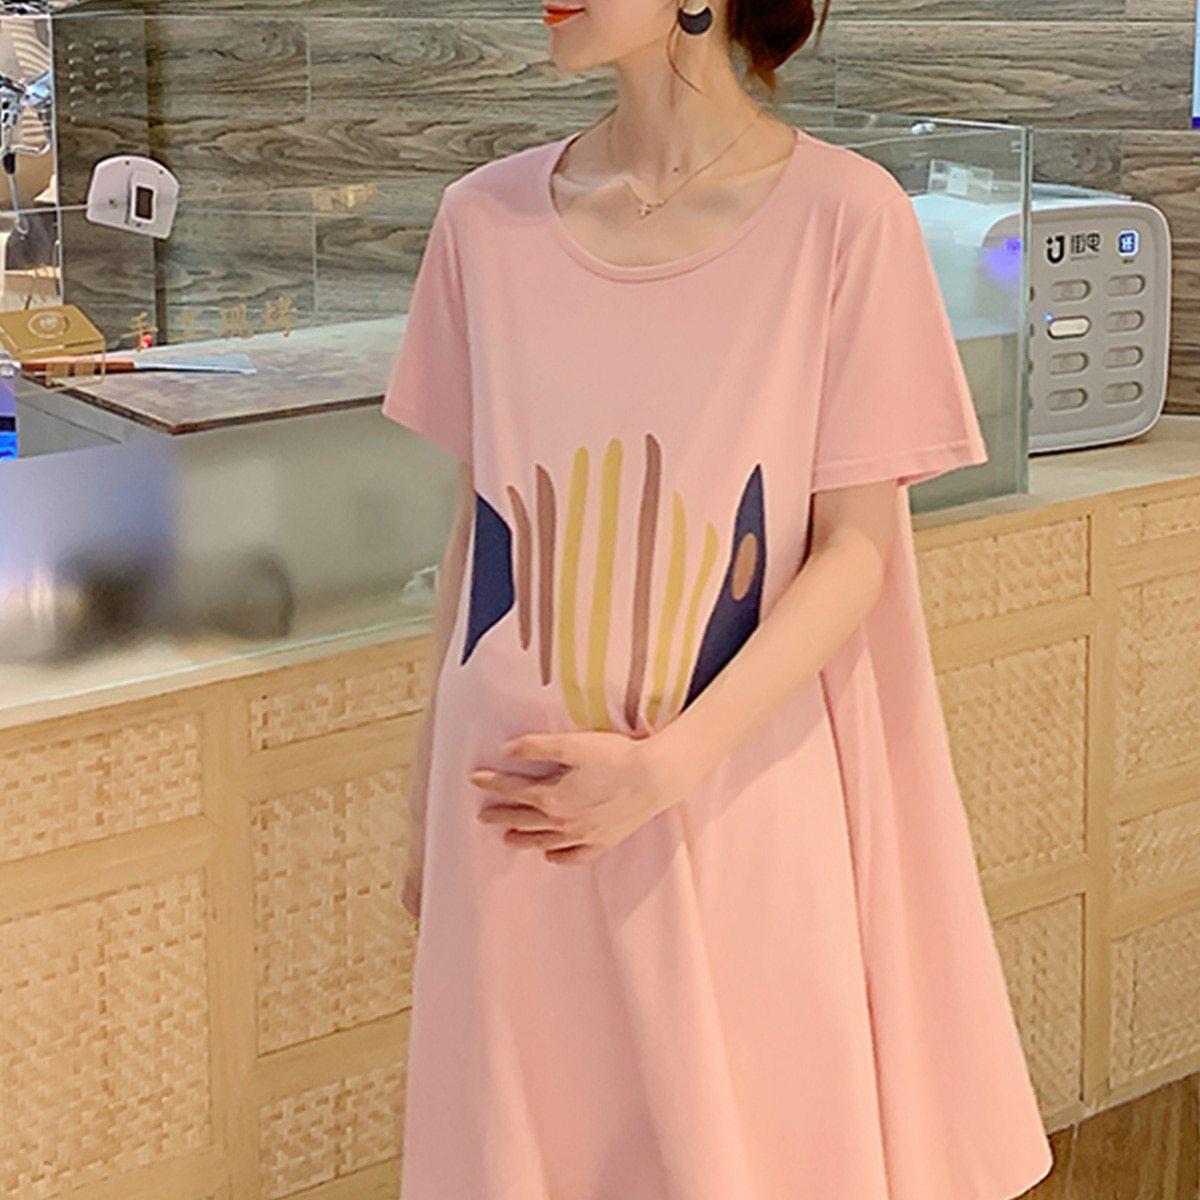 Maternity Dress Cartoon Simple Short Sleeve Loose Comfy Dress image 2